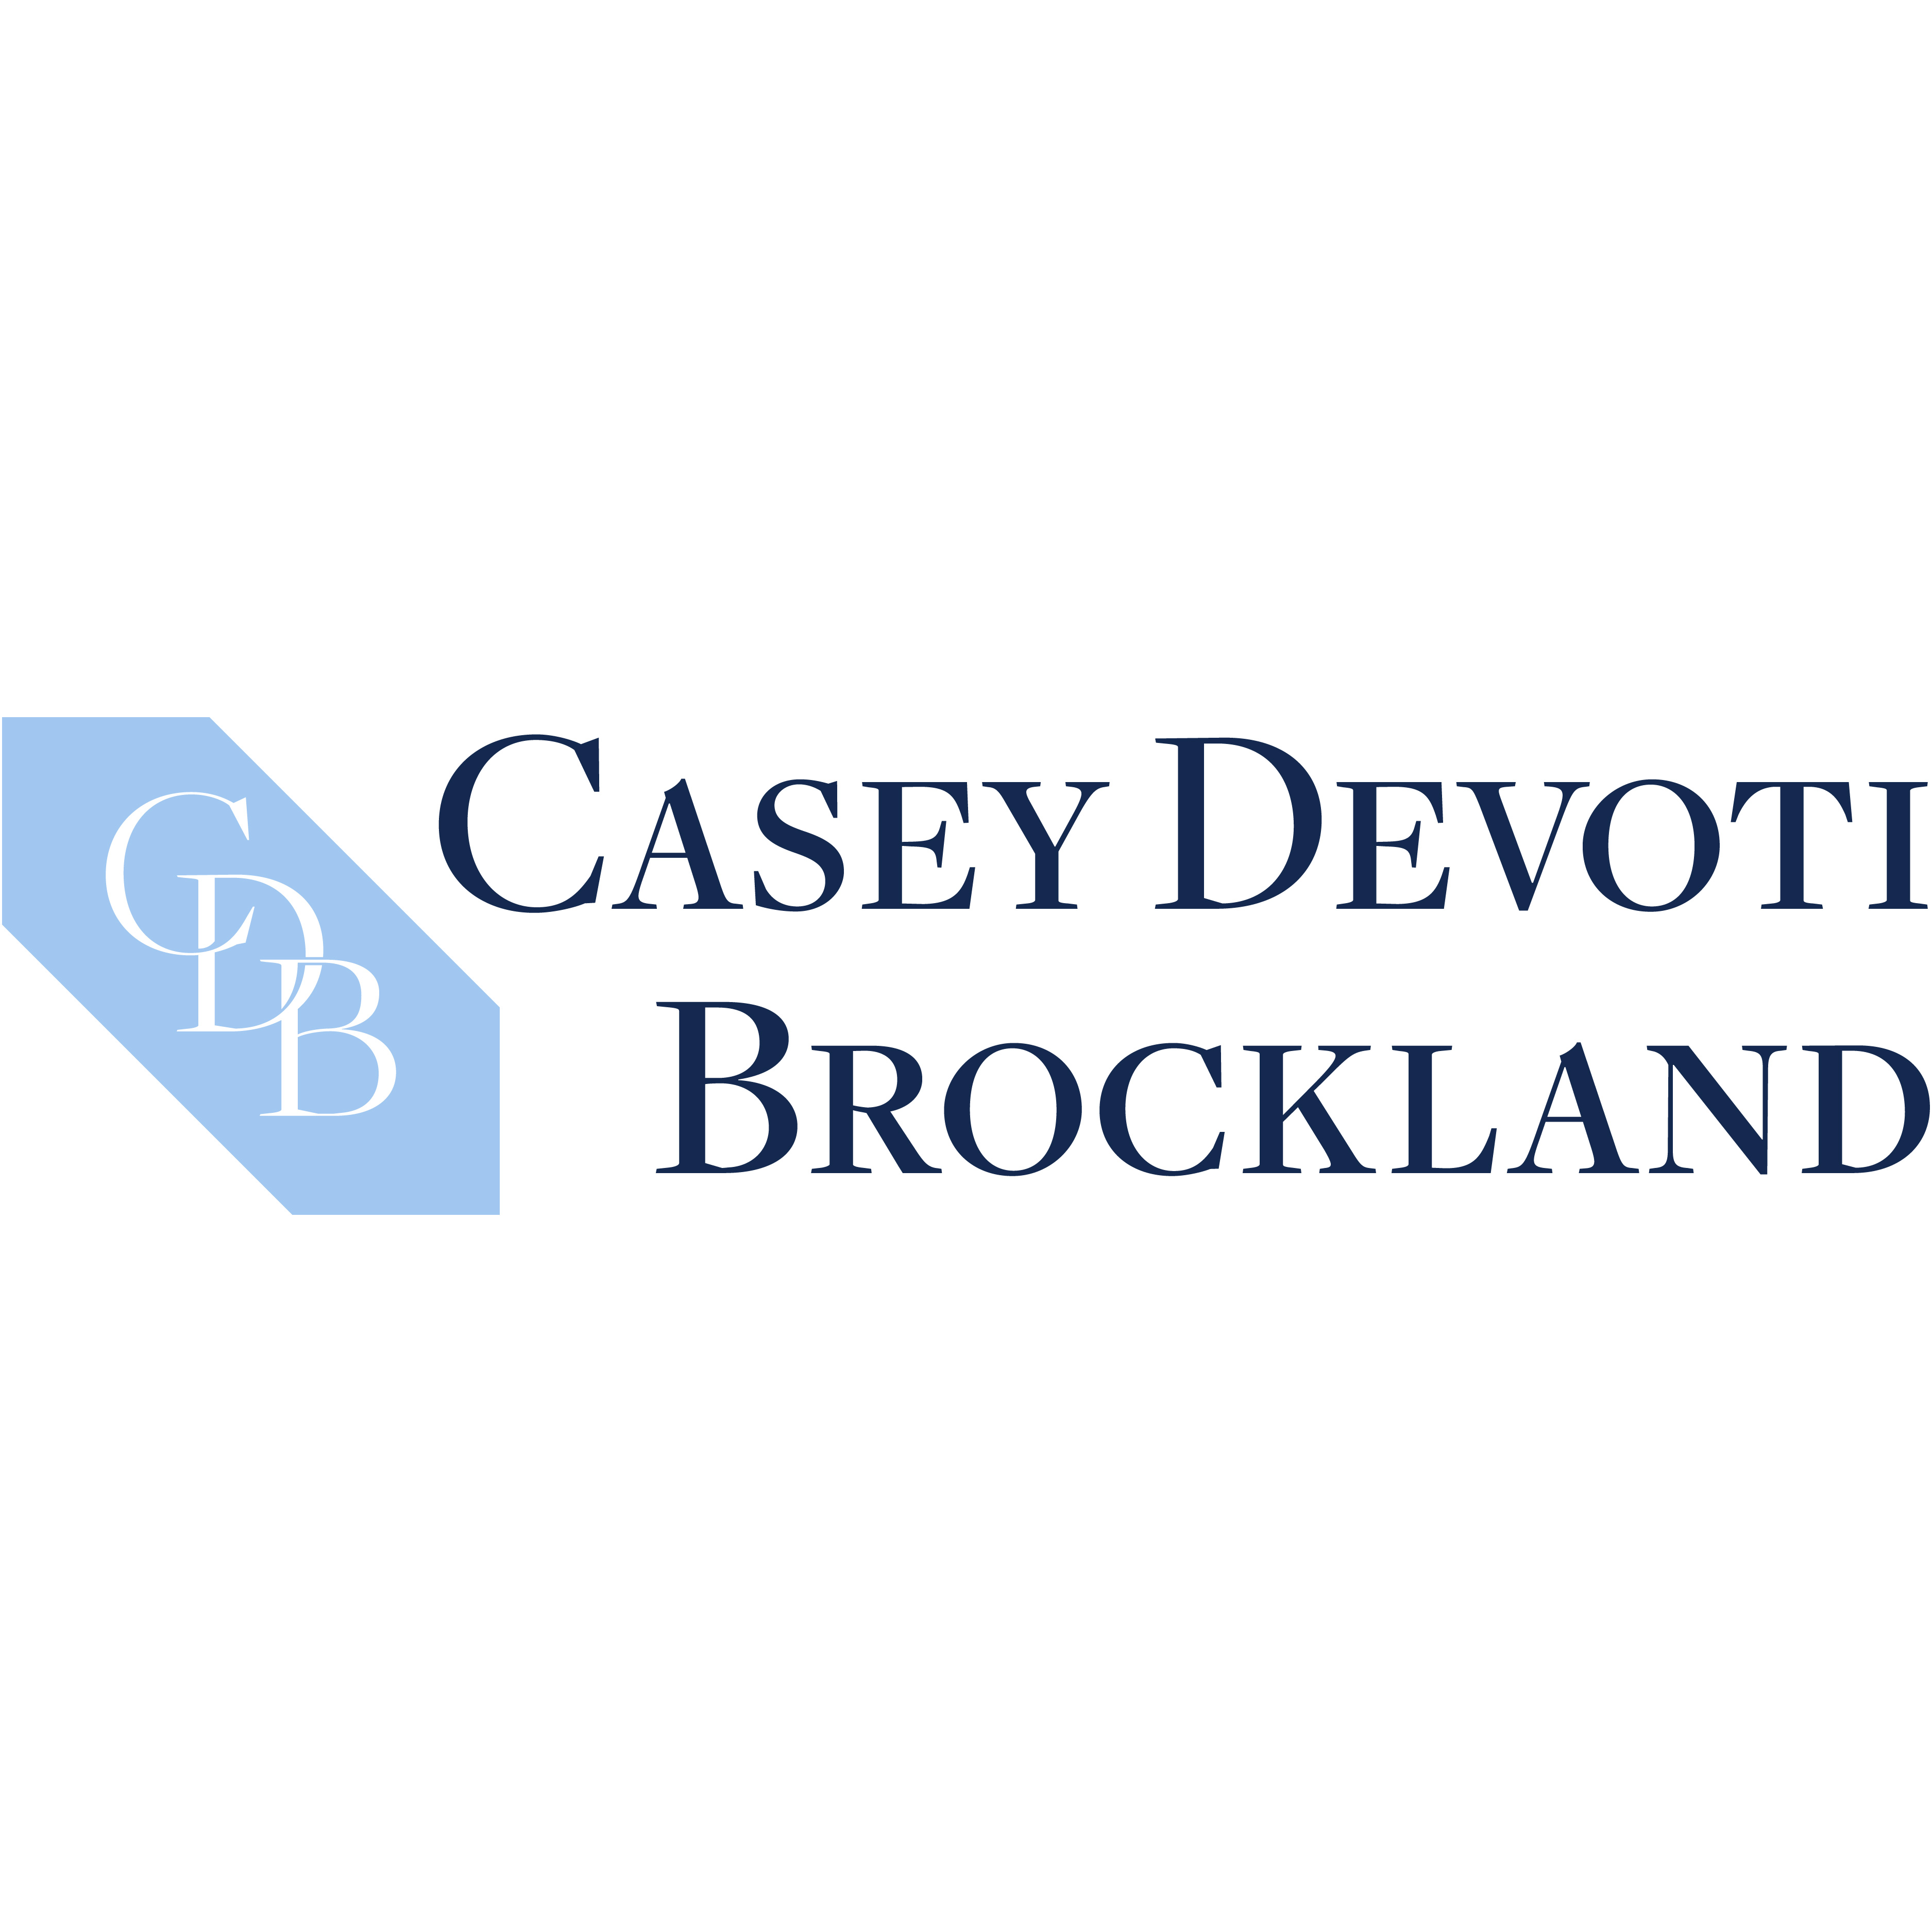 Casey Devoti & Brockland Logo 4